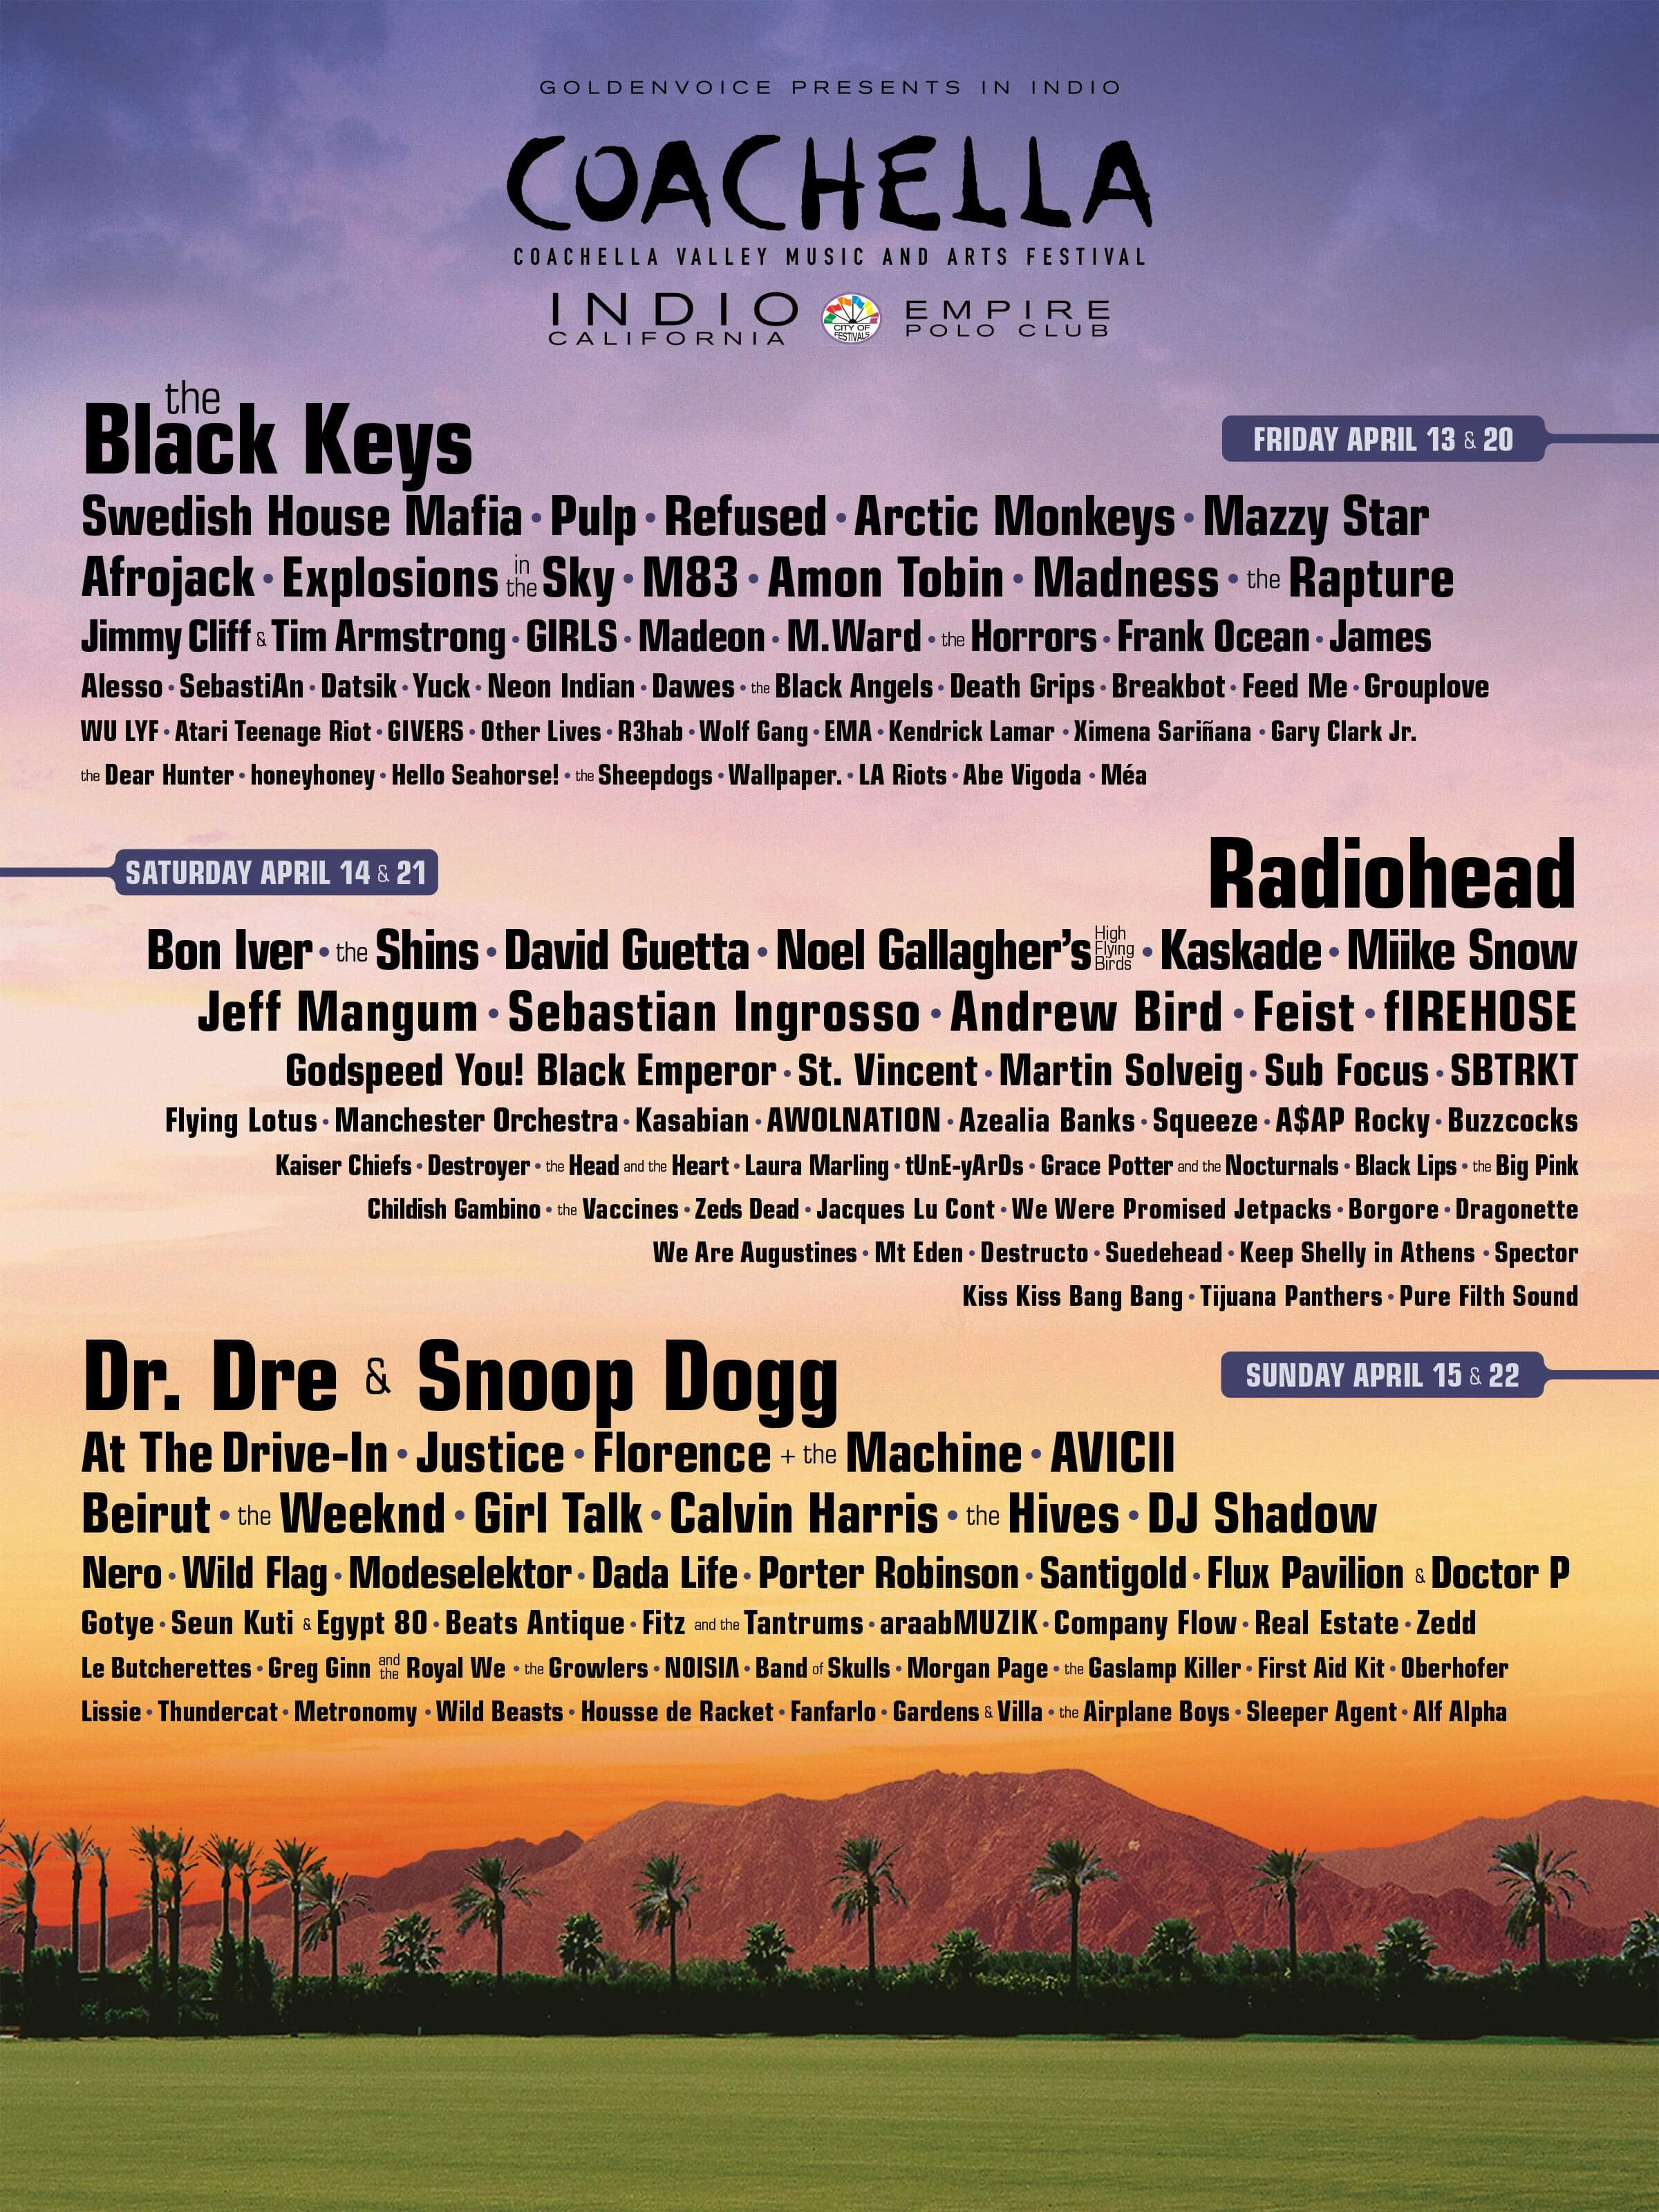 Coachella 2012 Lineup Poster